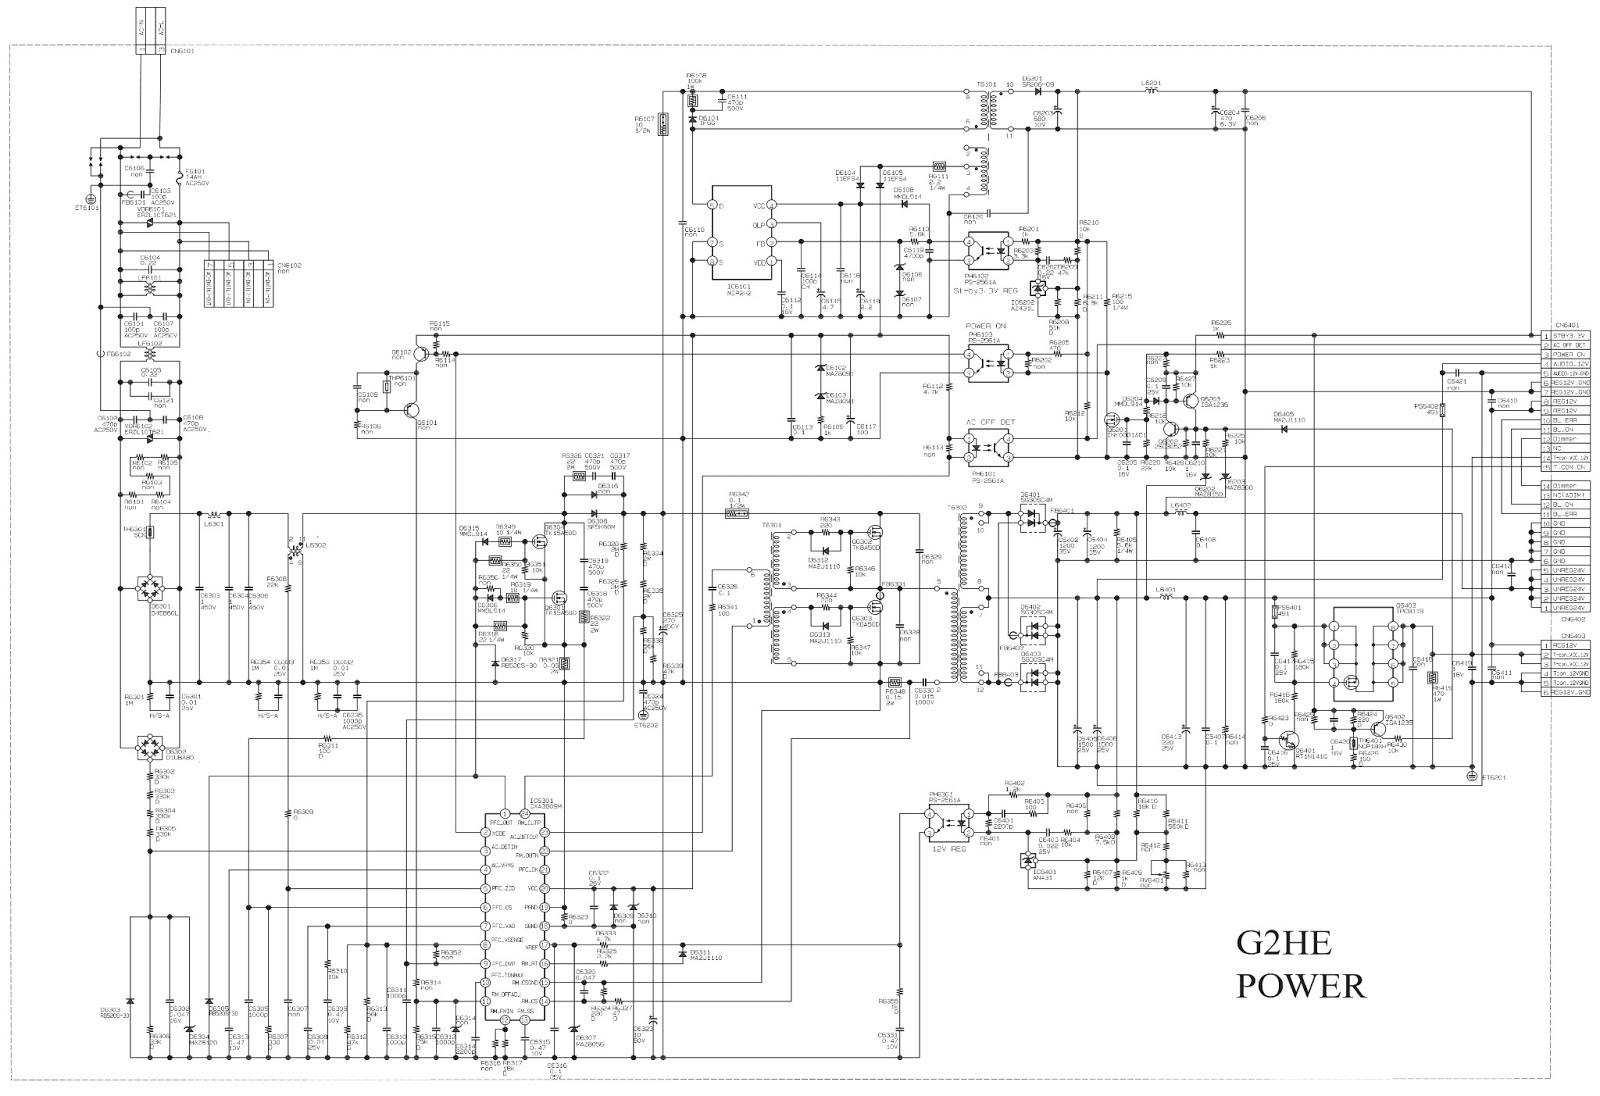 [DIAGRAM] Sony Klv 32ex330 Circuit Diagram FULL Version HD